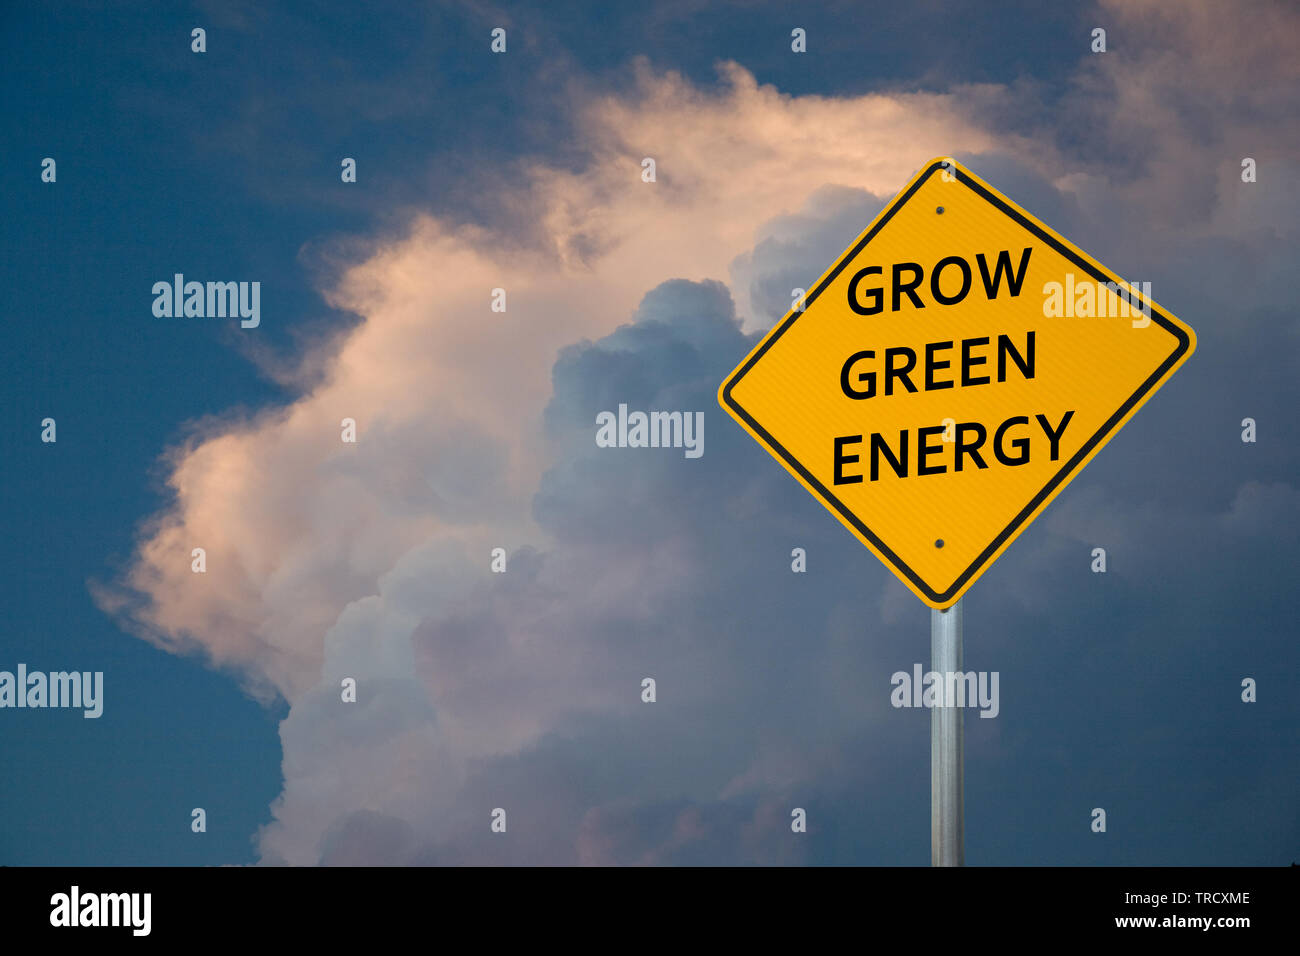 Grow Green Energy Stock Photo